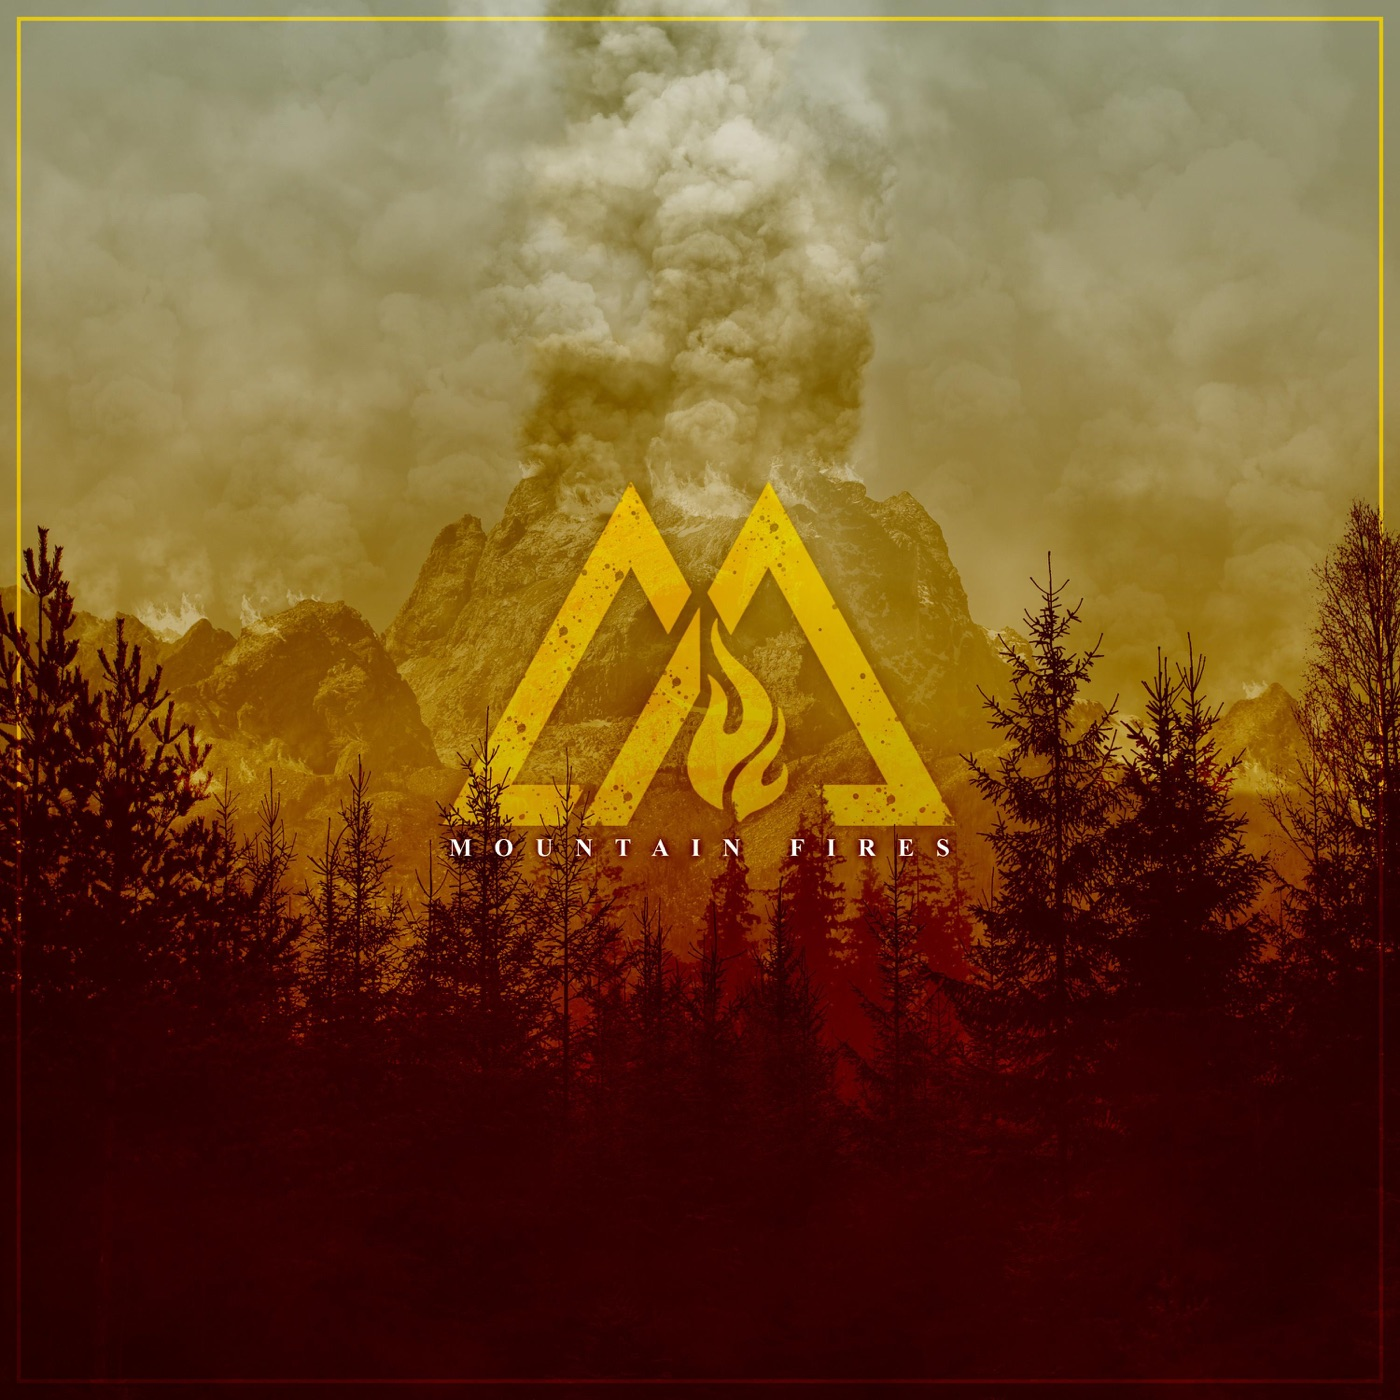 Mountain Fires - Listener [single] (2019)